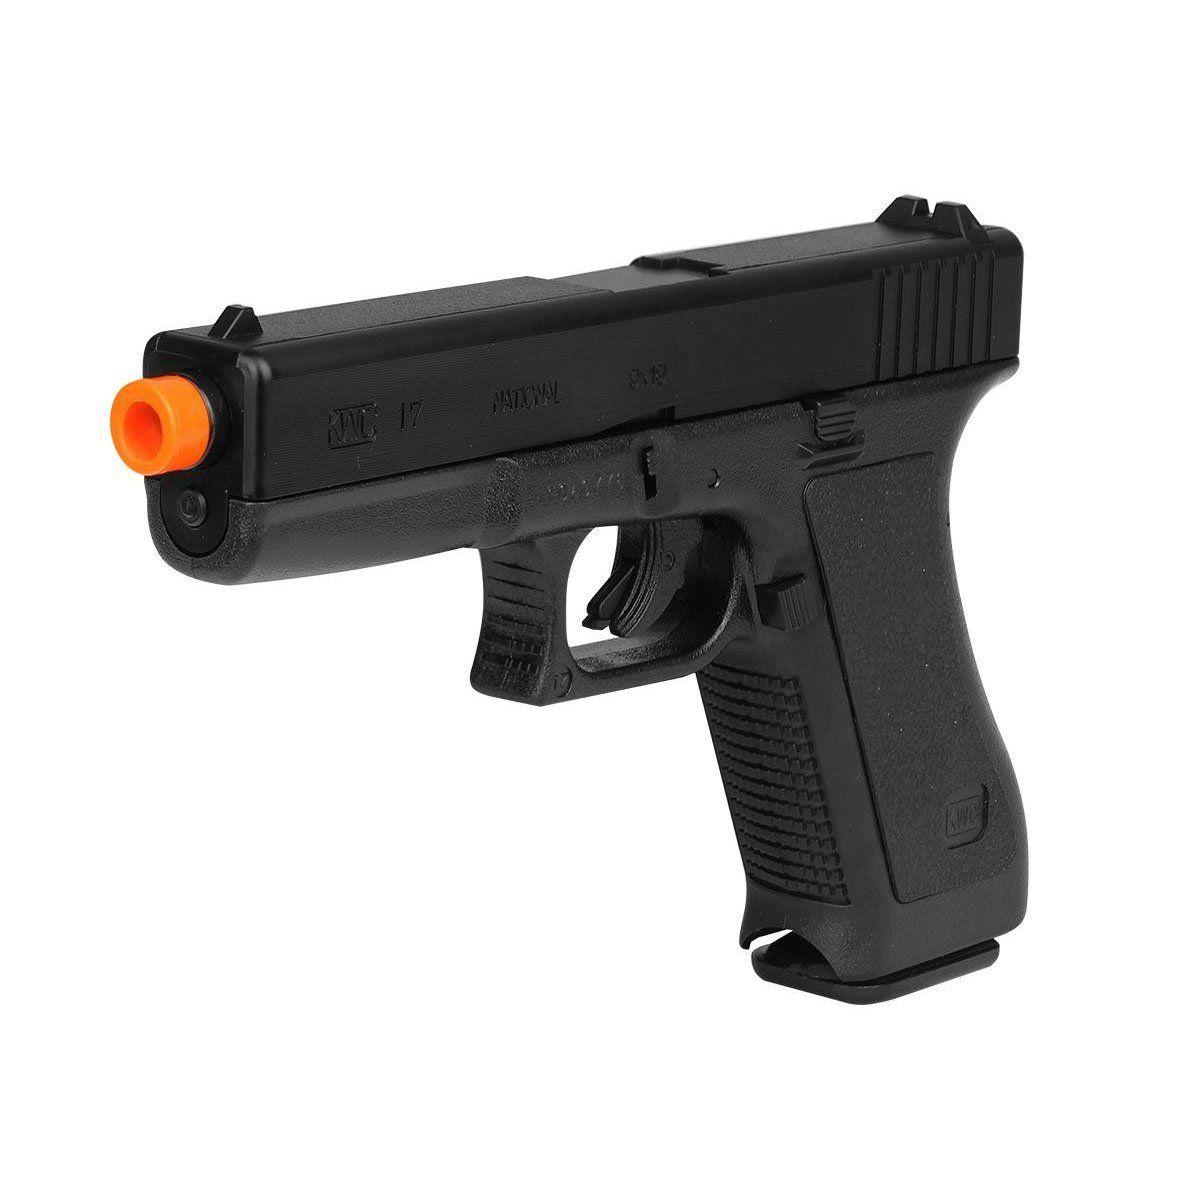 Pistola Airsoft Glock G7 Spring Gun KWC Calibre 6mm